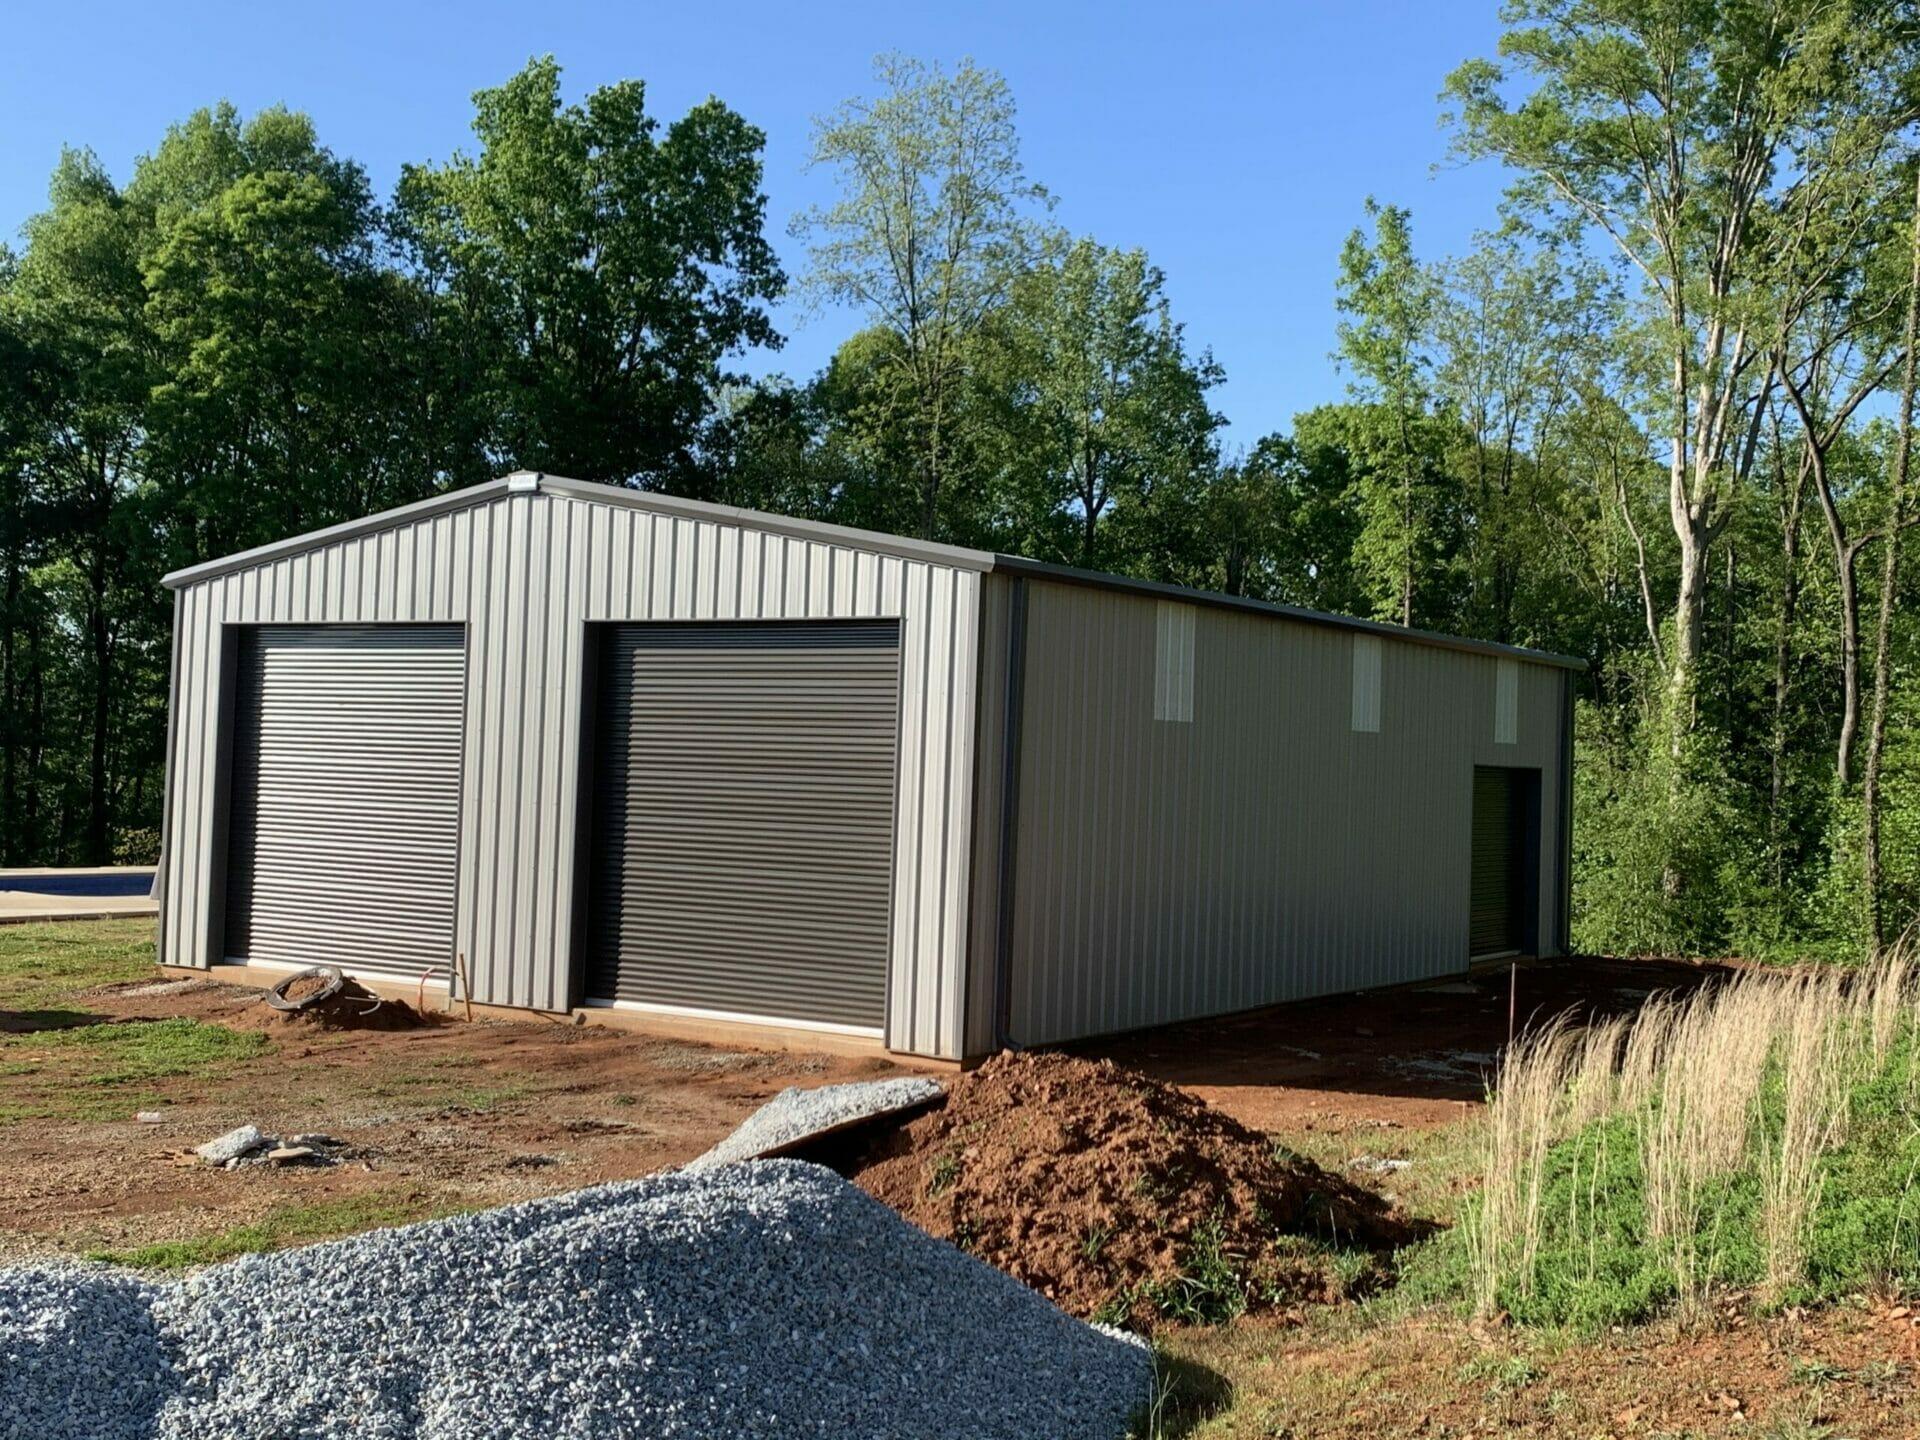 Custom Pre-Engineered Metal Multi-Bay Garage Building With Roll Up Garage Doors And Side Entry Door